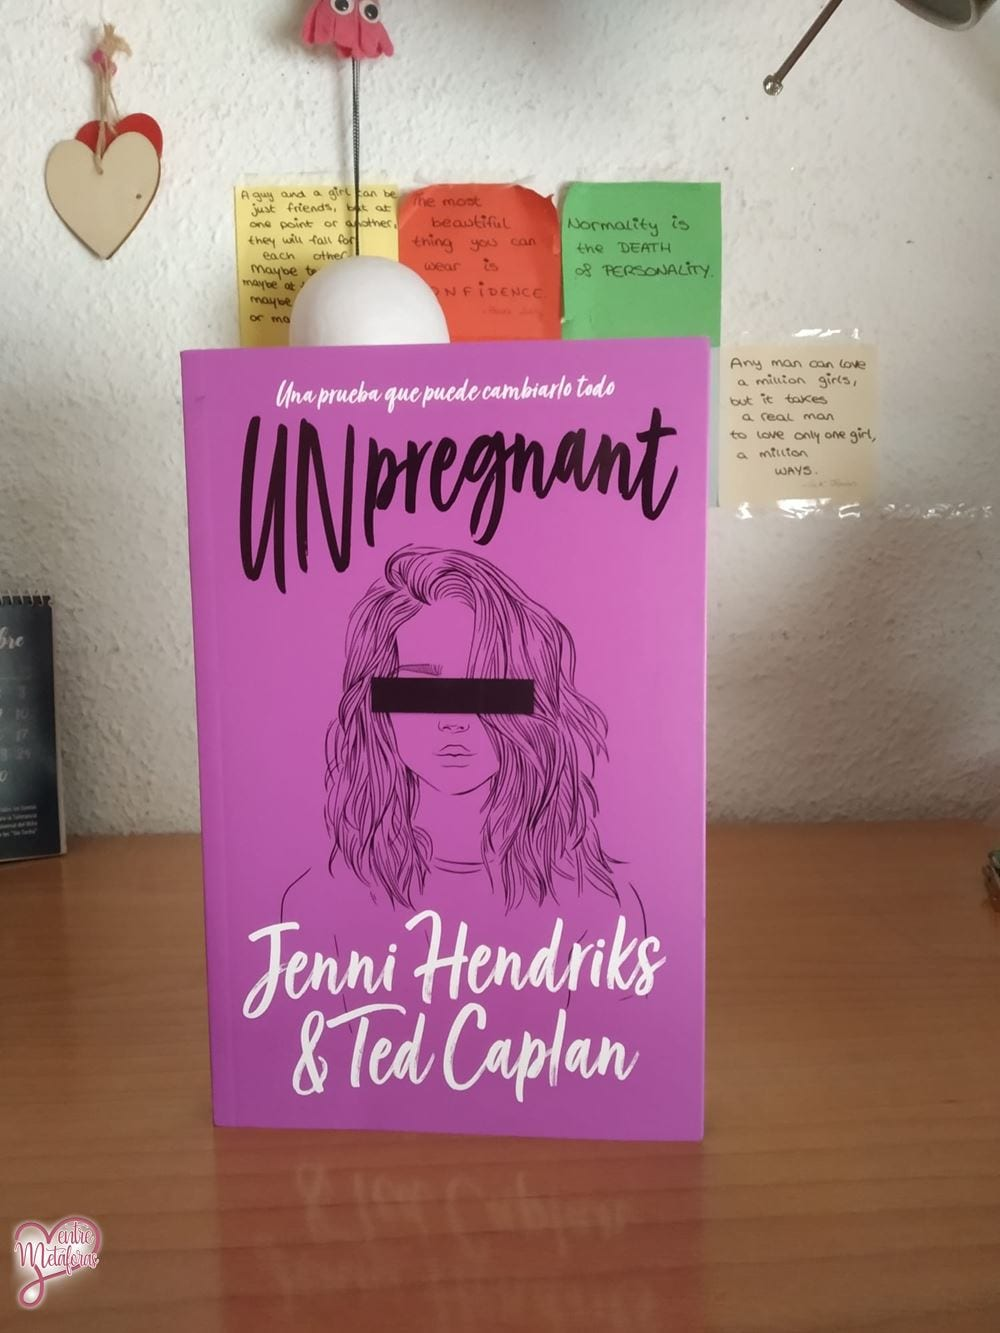 Unpregnant, de Jenni Hendriks y Ted Caplan - Reseña